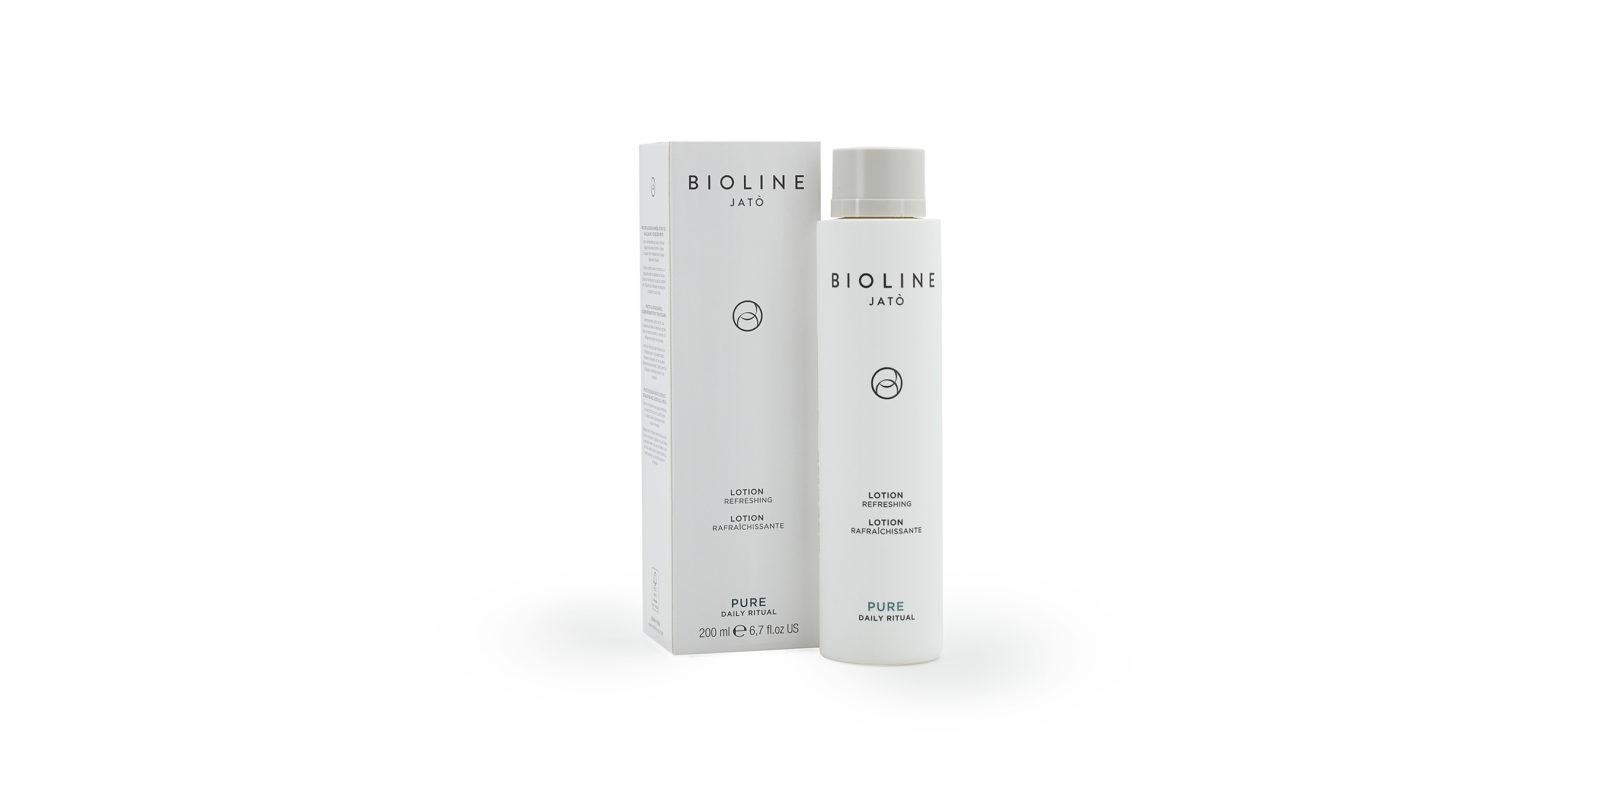 Bioline Jatò Pure Daily Ritual Lotion Refreshing